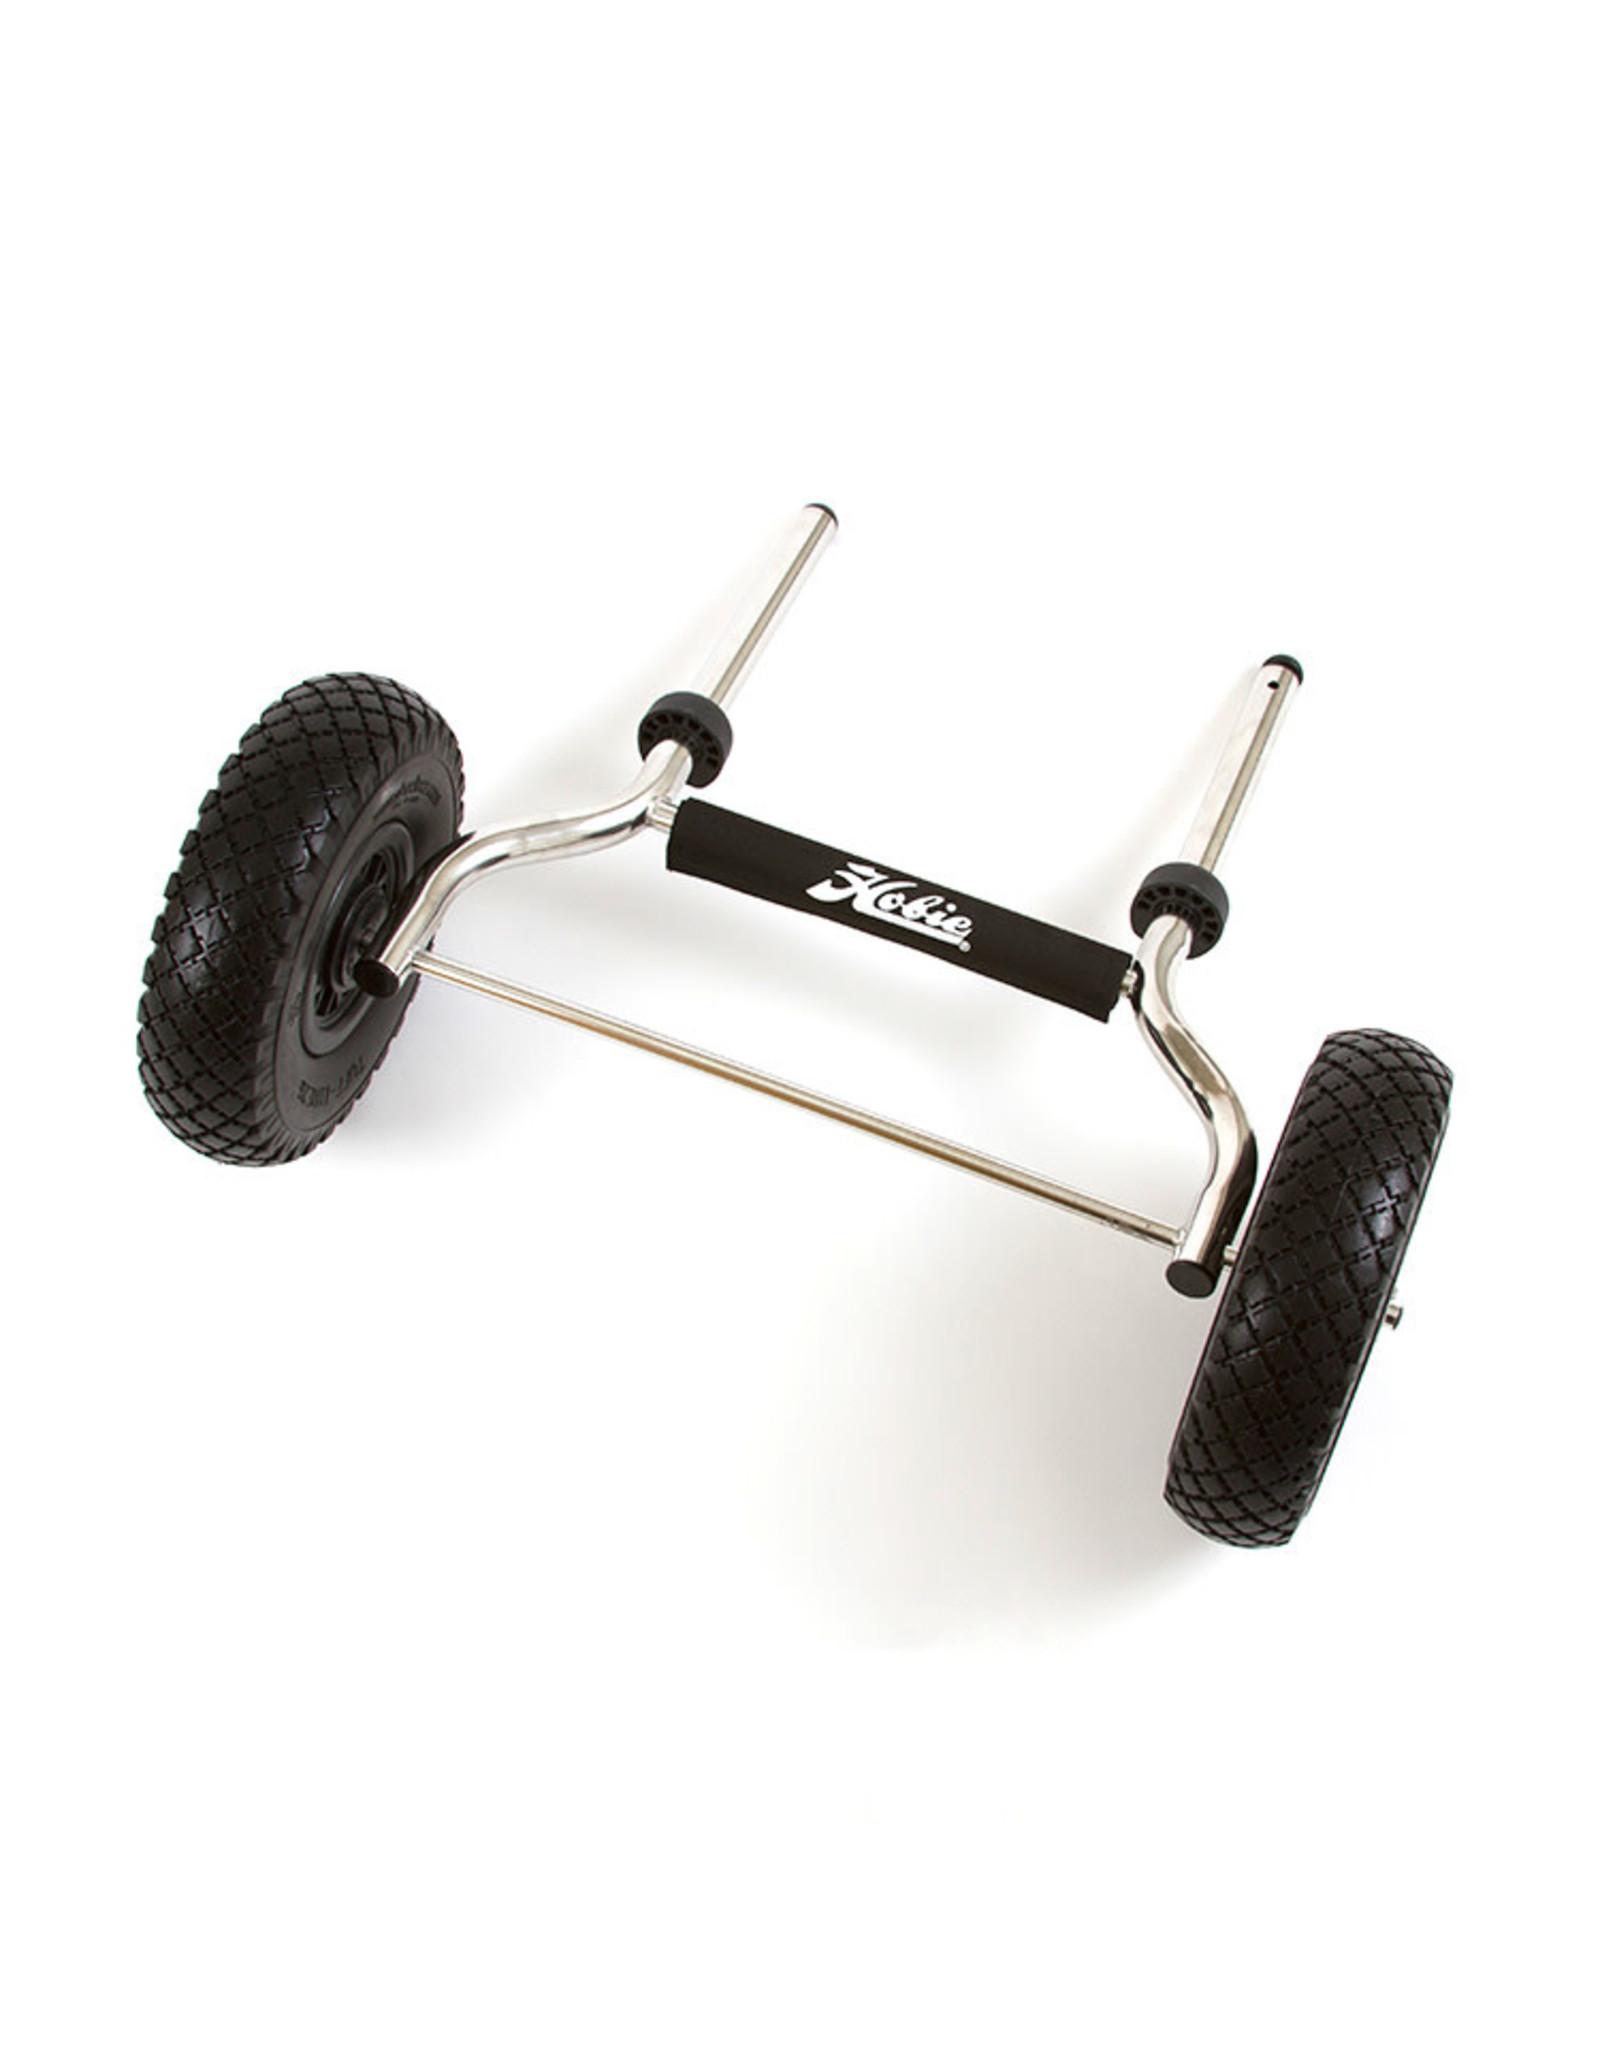 Hobie Hobie Heavy Duty Plug-In Cart